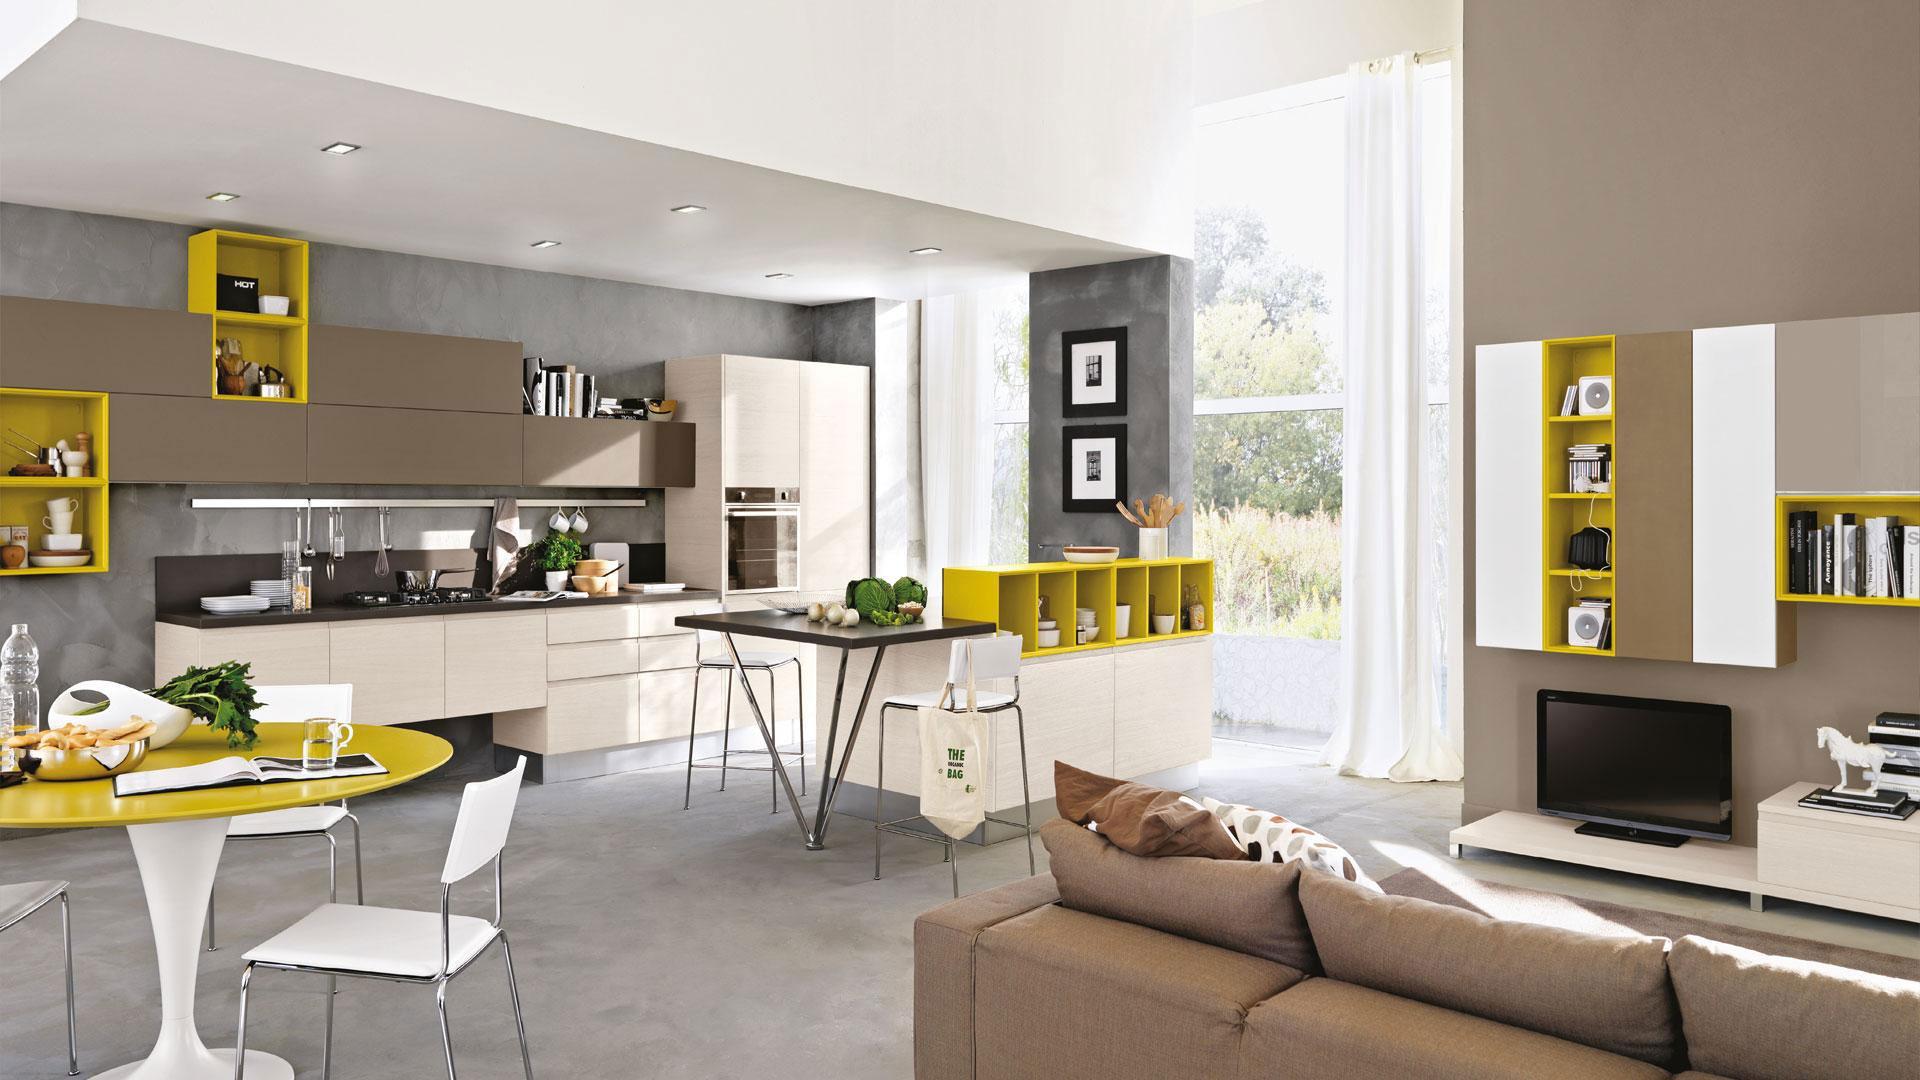 Cucine Moderne Color Ciliegio. Cucine Moderne Color Ciliegio. Cucine ...